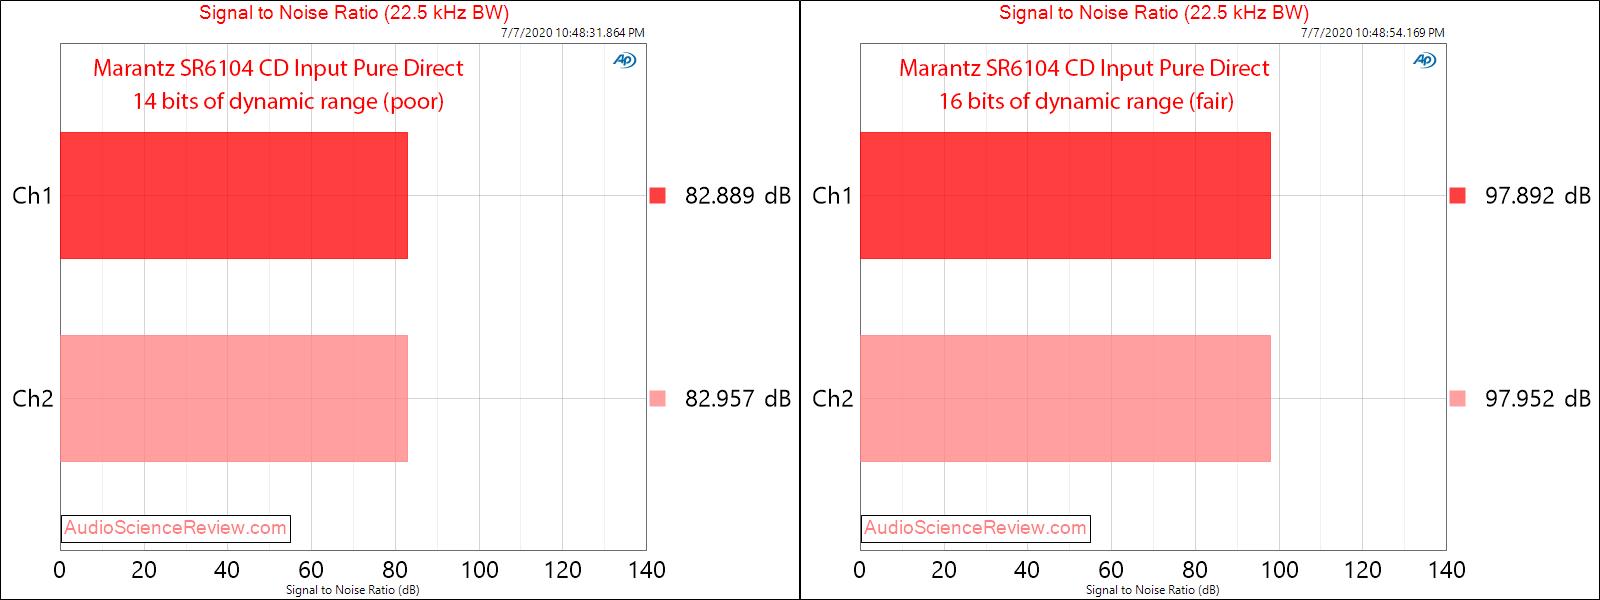 Marantz SR6104 Home Theater AVR Amplifier CD Input SNR Audio Measurements.png